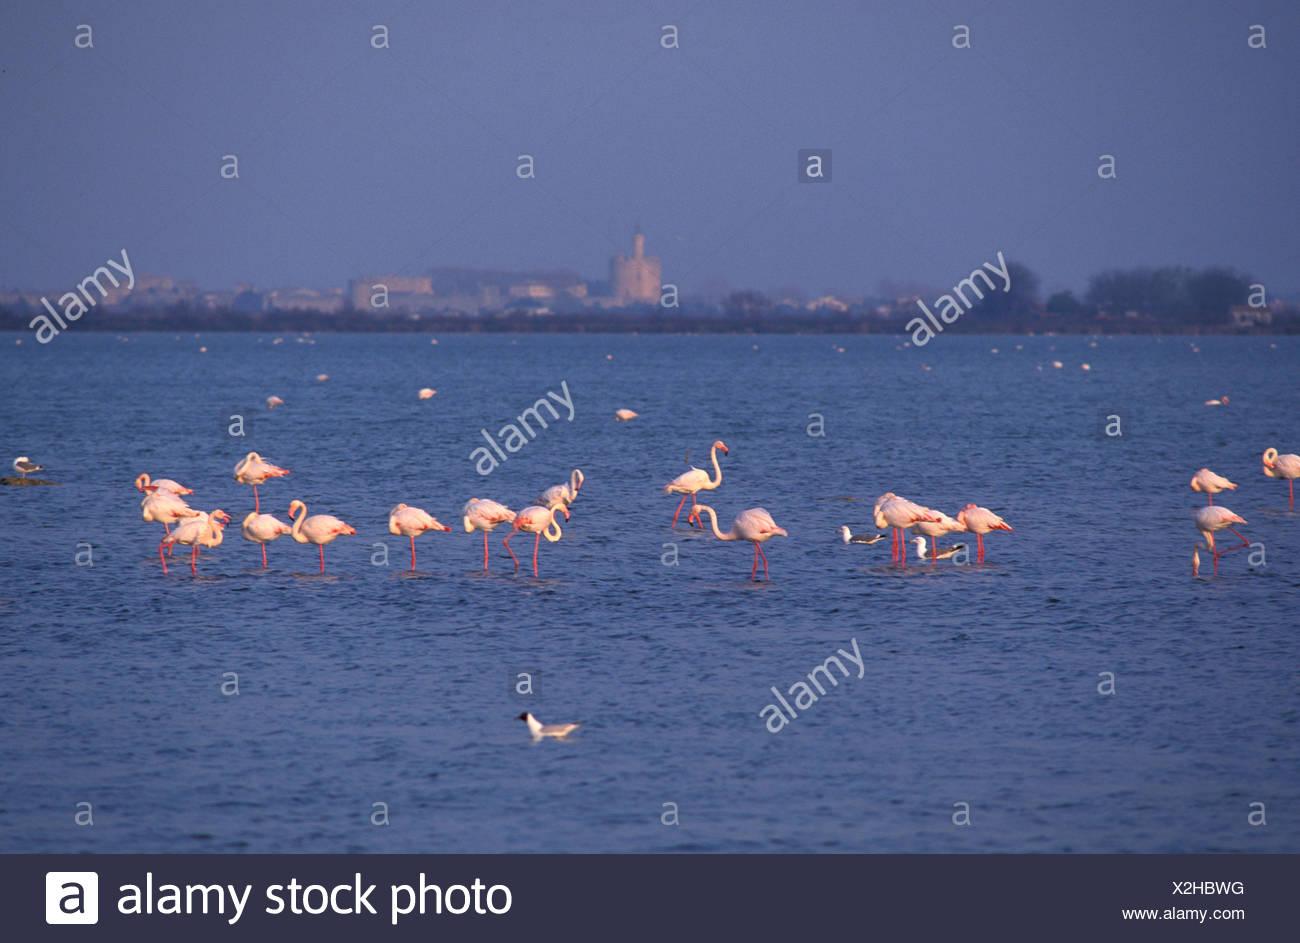 Flamingos, near Aigues-Mortes, Camargue, Provence, France, Europe, birds - Stock Image